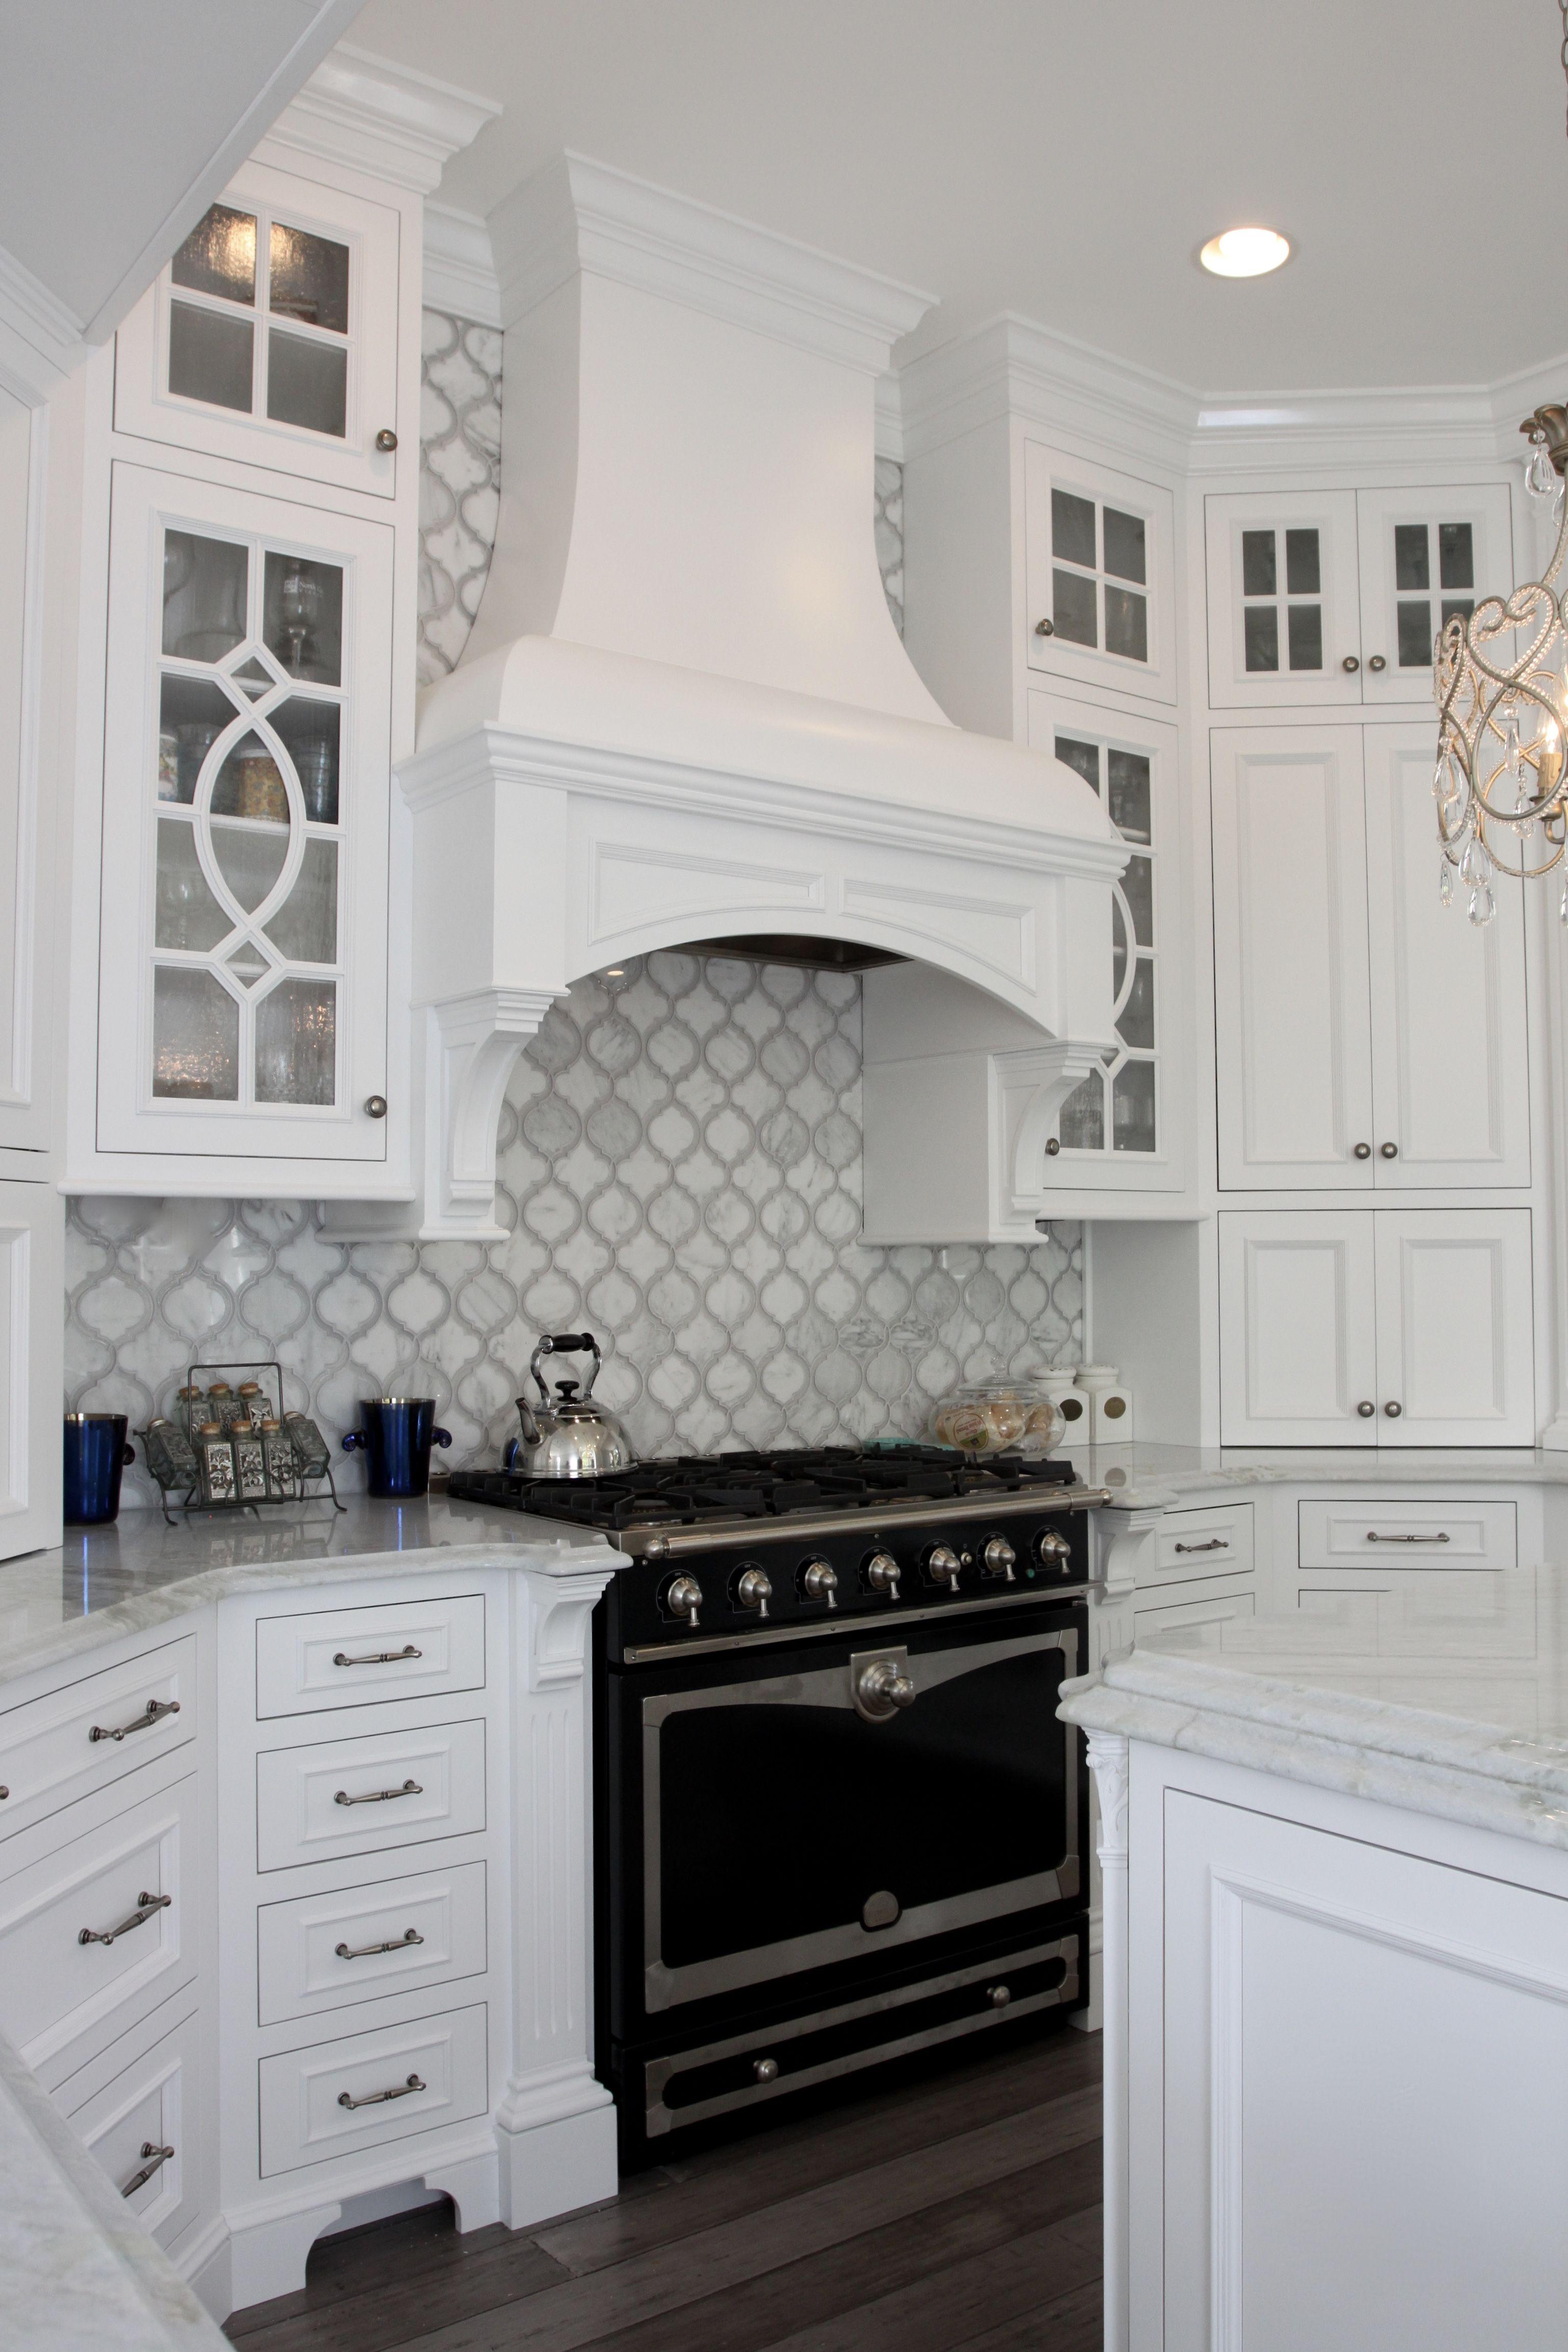 custom white wood hood and la cornue 36 inch range. Black Bedroom Furniture Sets. Home Design Ideas